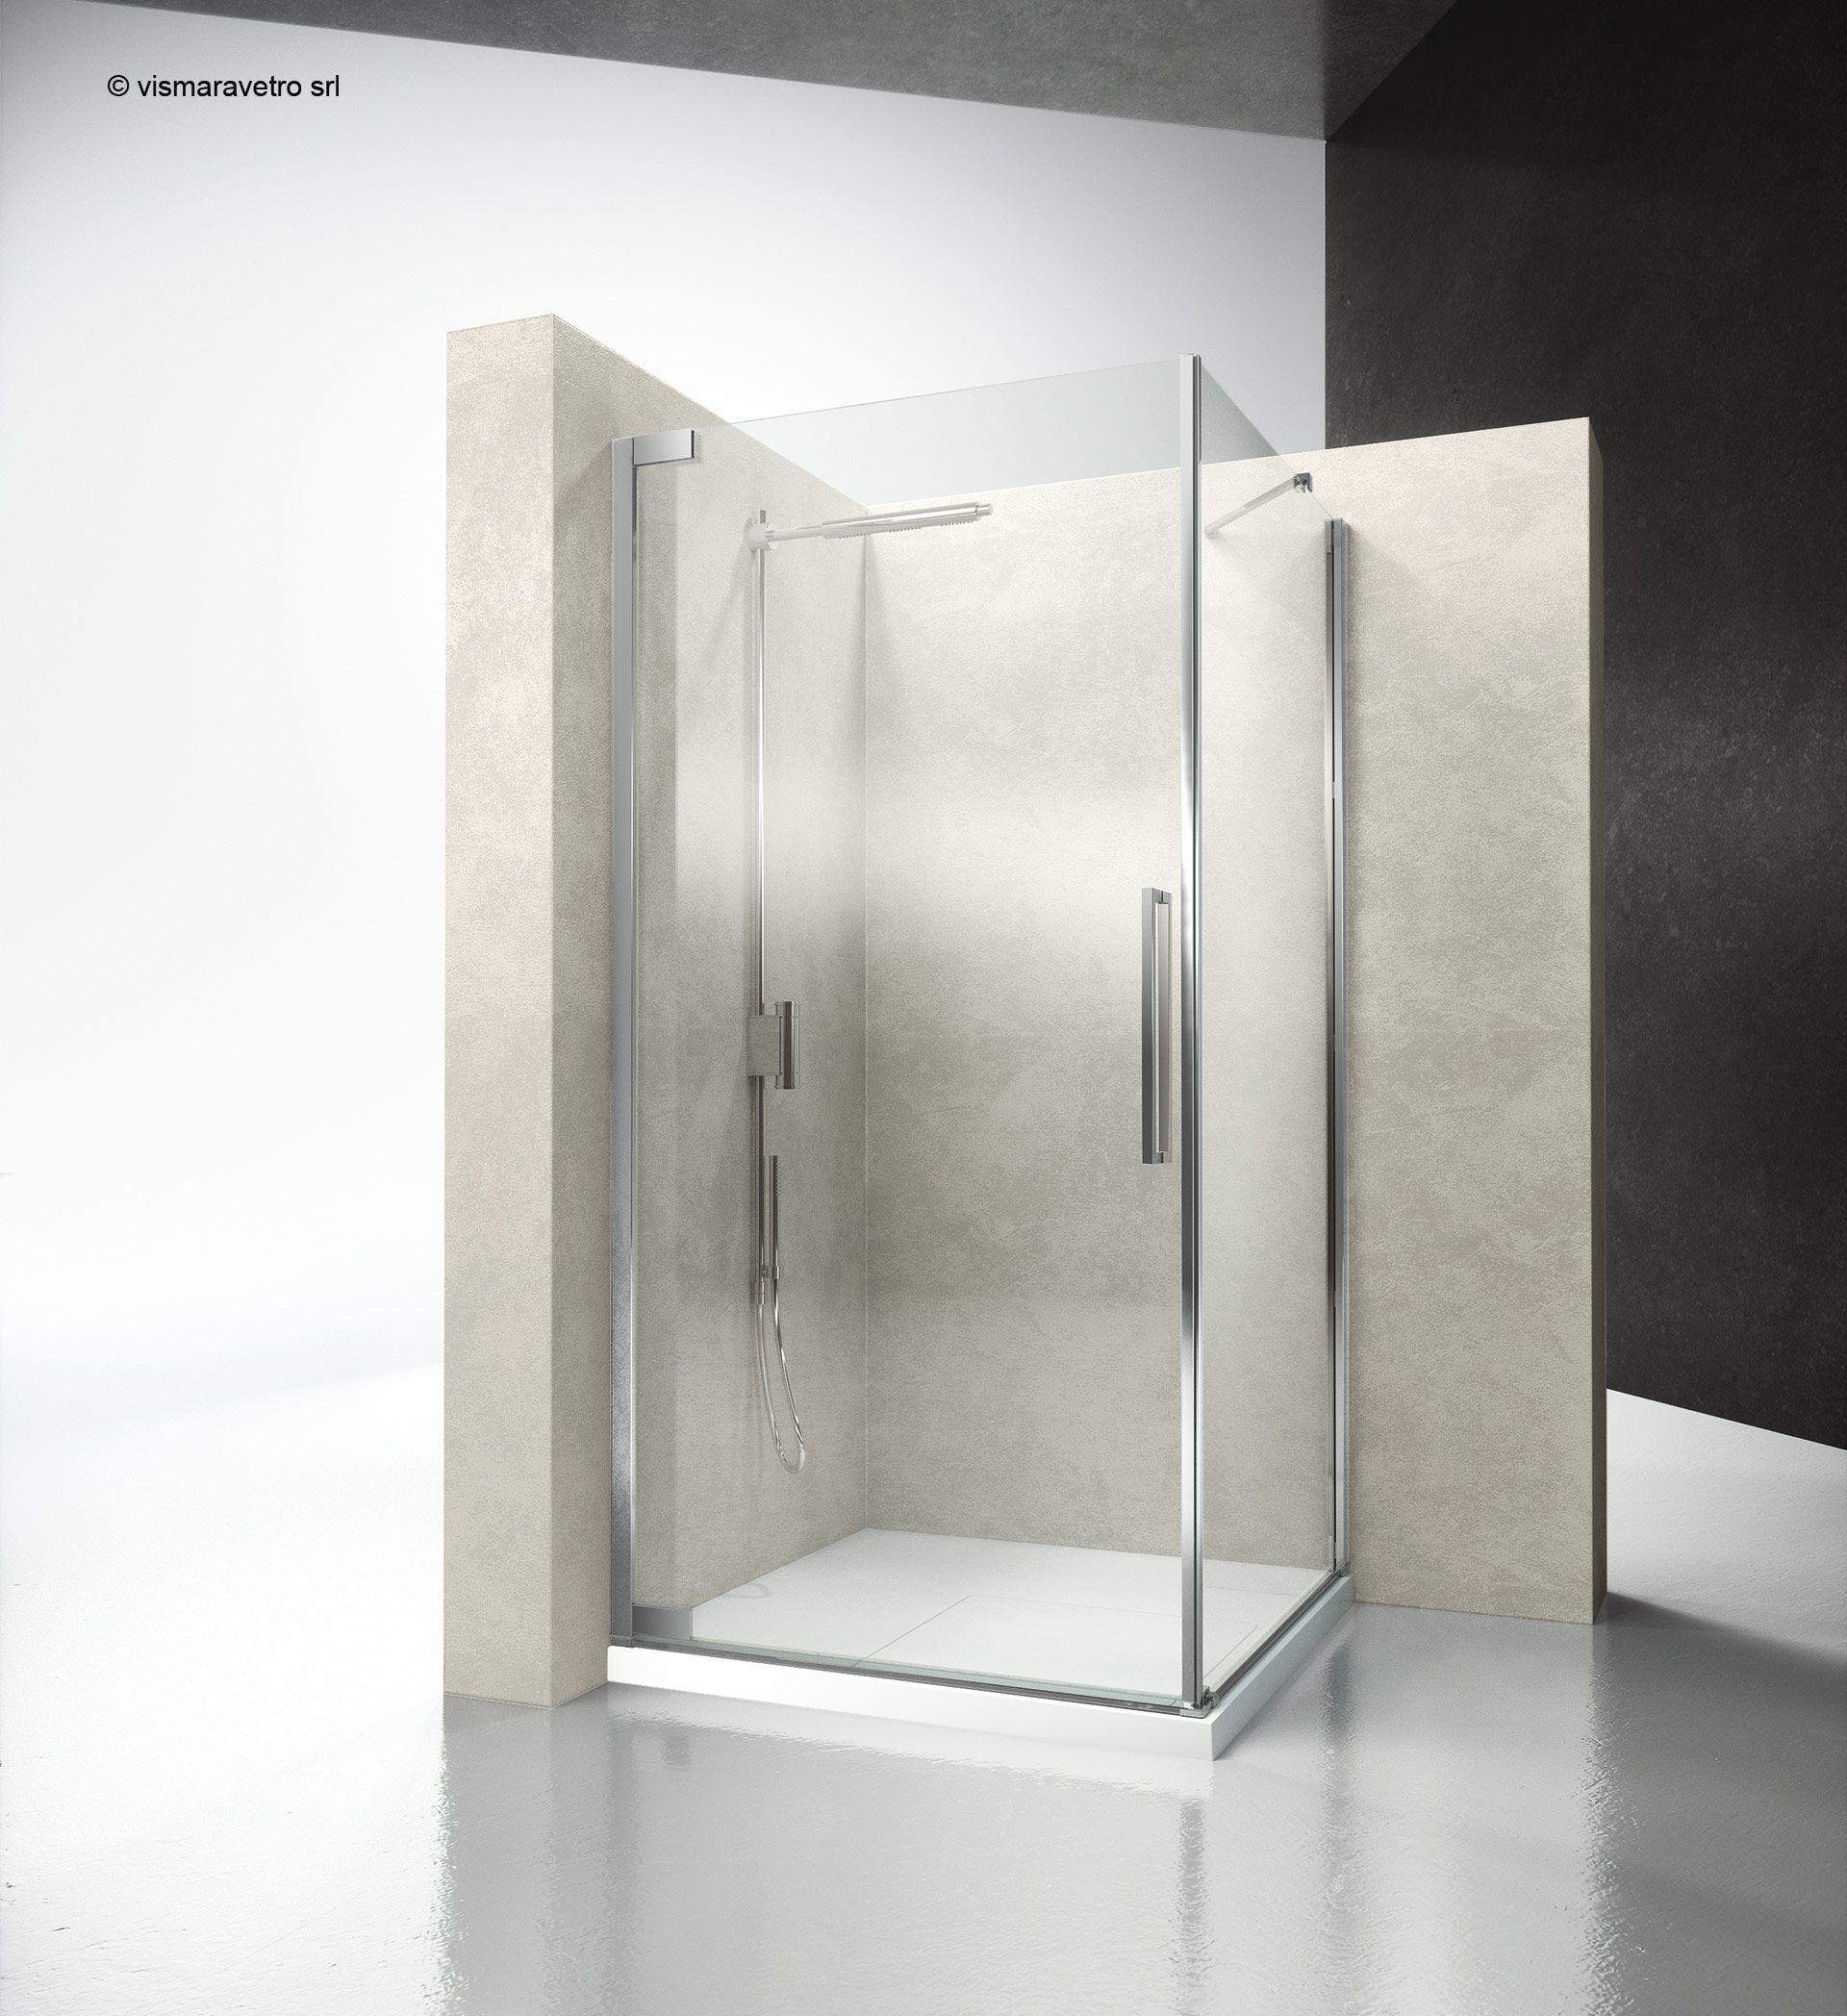 Fa Ff Flare Shower Enclosures Models Pivot Door Hinged Door Shower Enclosure Flare The New Hinged Door Shower Enclosure By Vismaravetro Bathroom Ideen